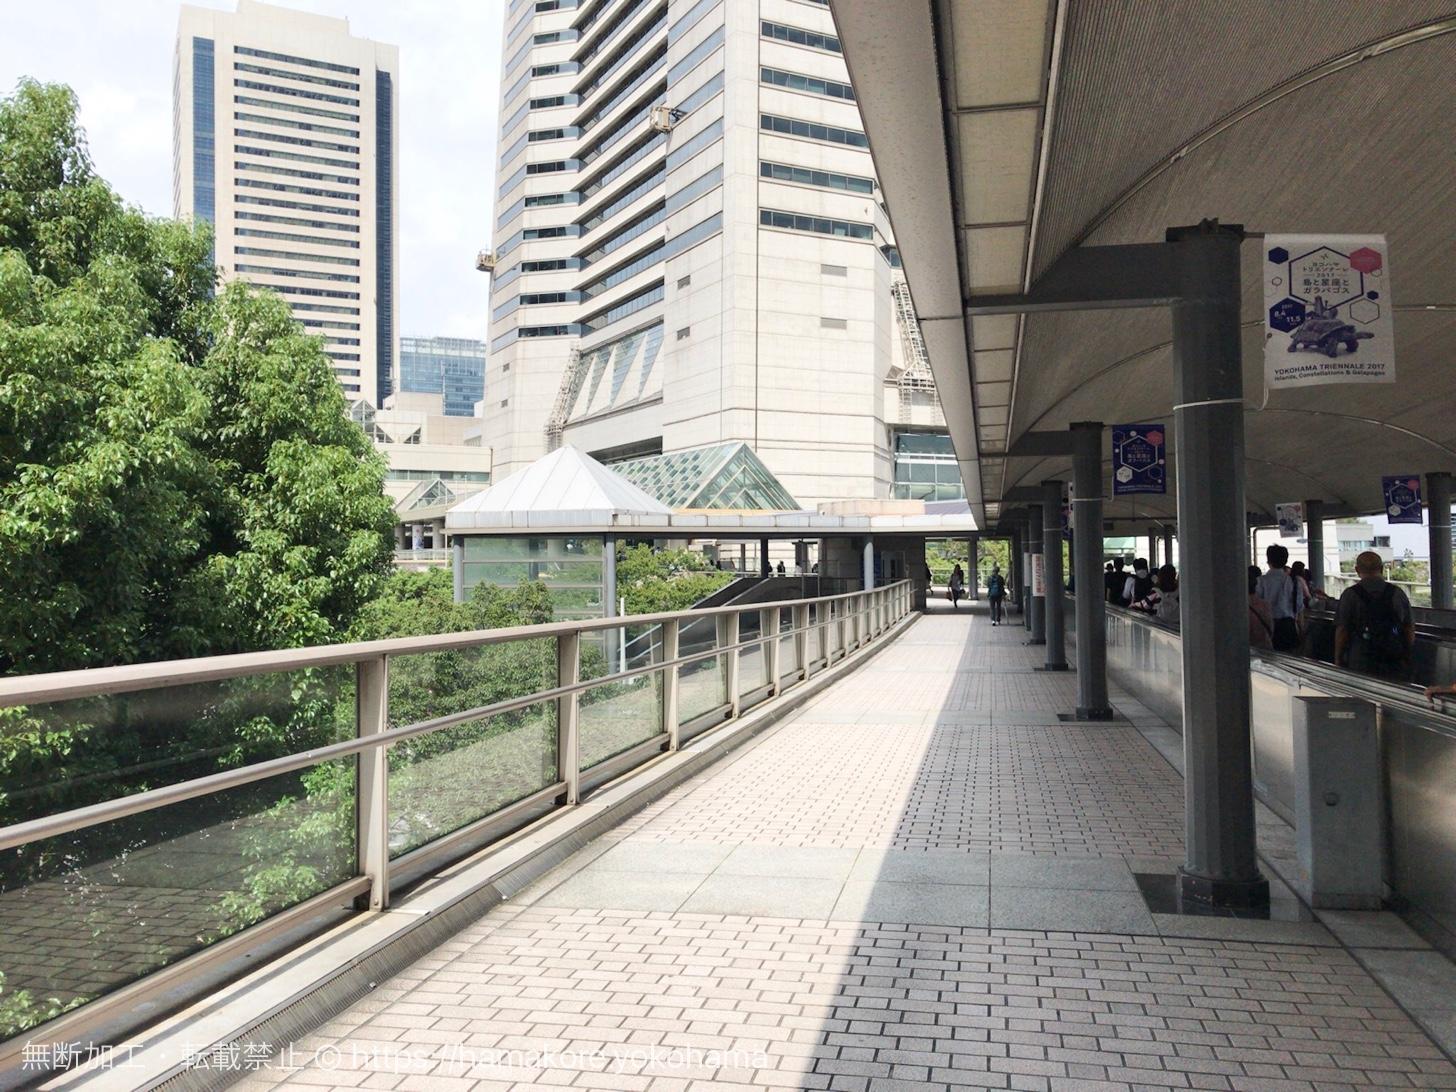 JR桜木町駅からランドマークプラザに向かう動く歩道